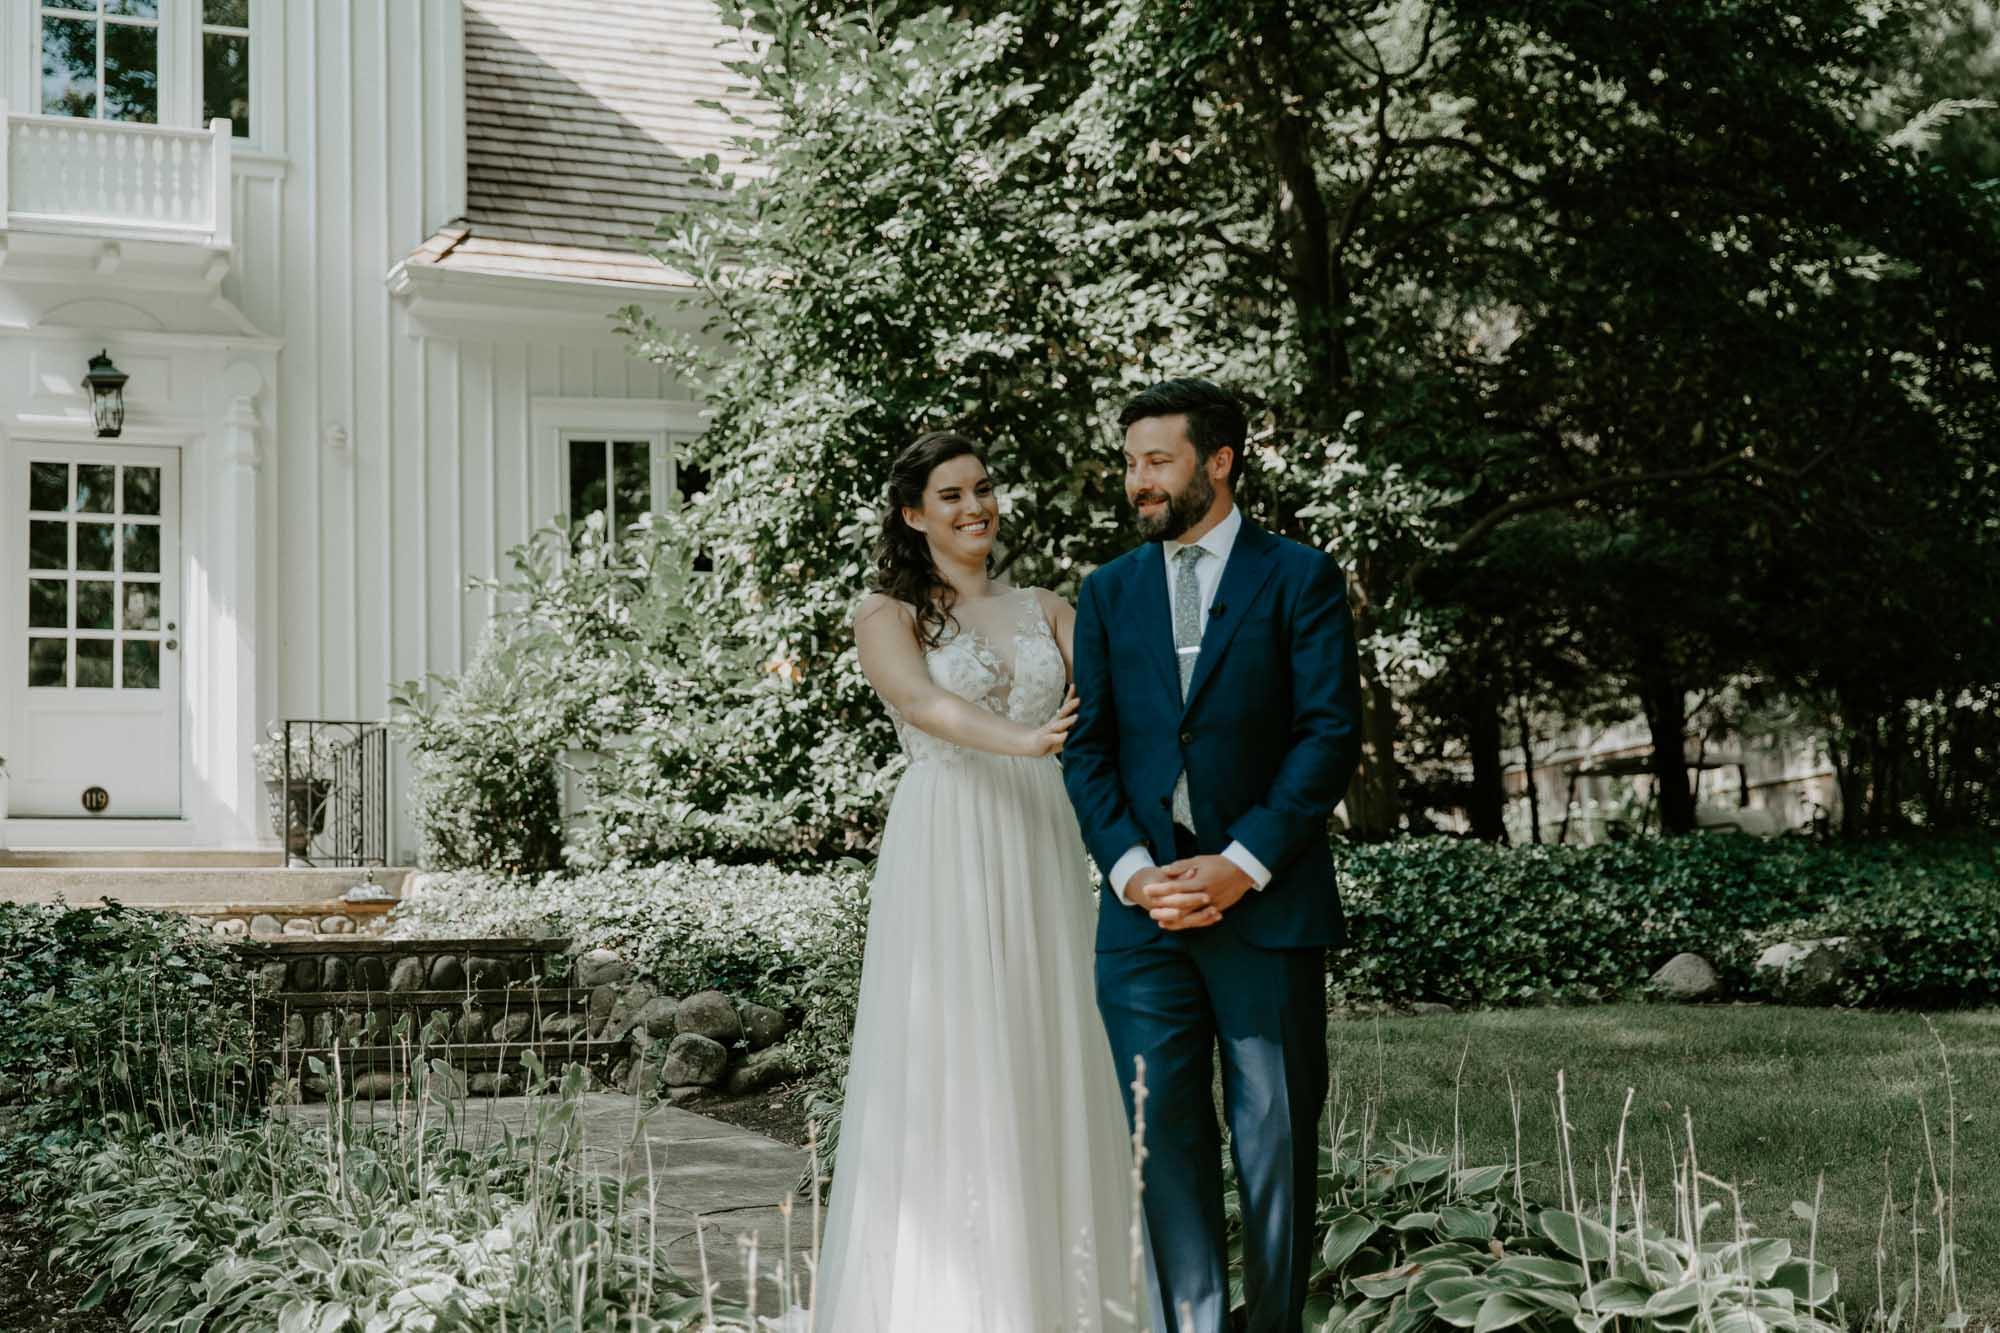 journeyman_distillery_wedding_photographer_chicago_il_wright_photographs-5847.jpg